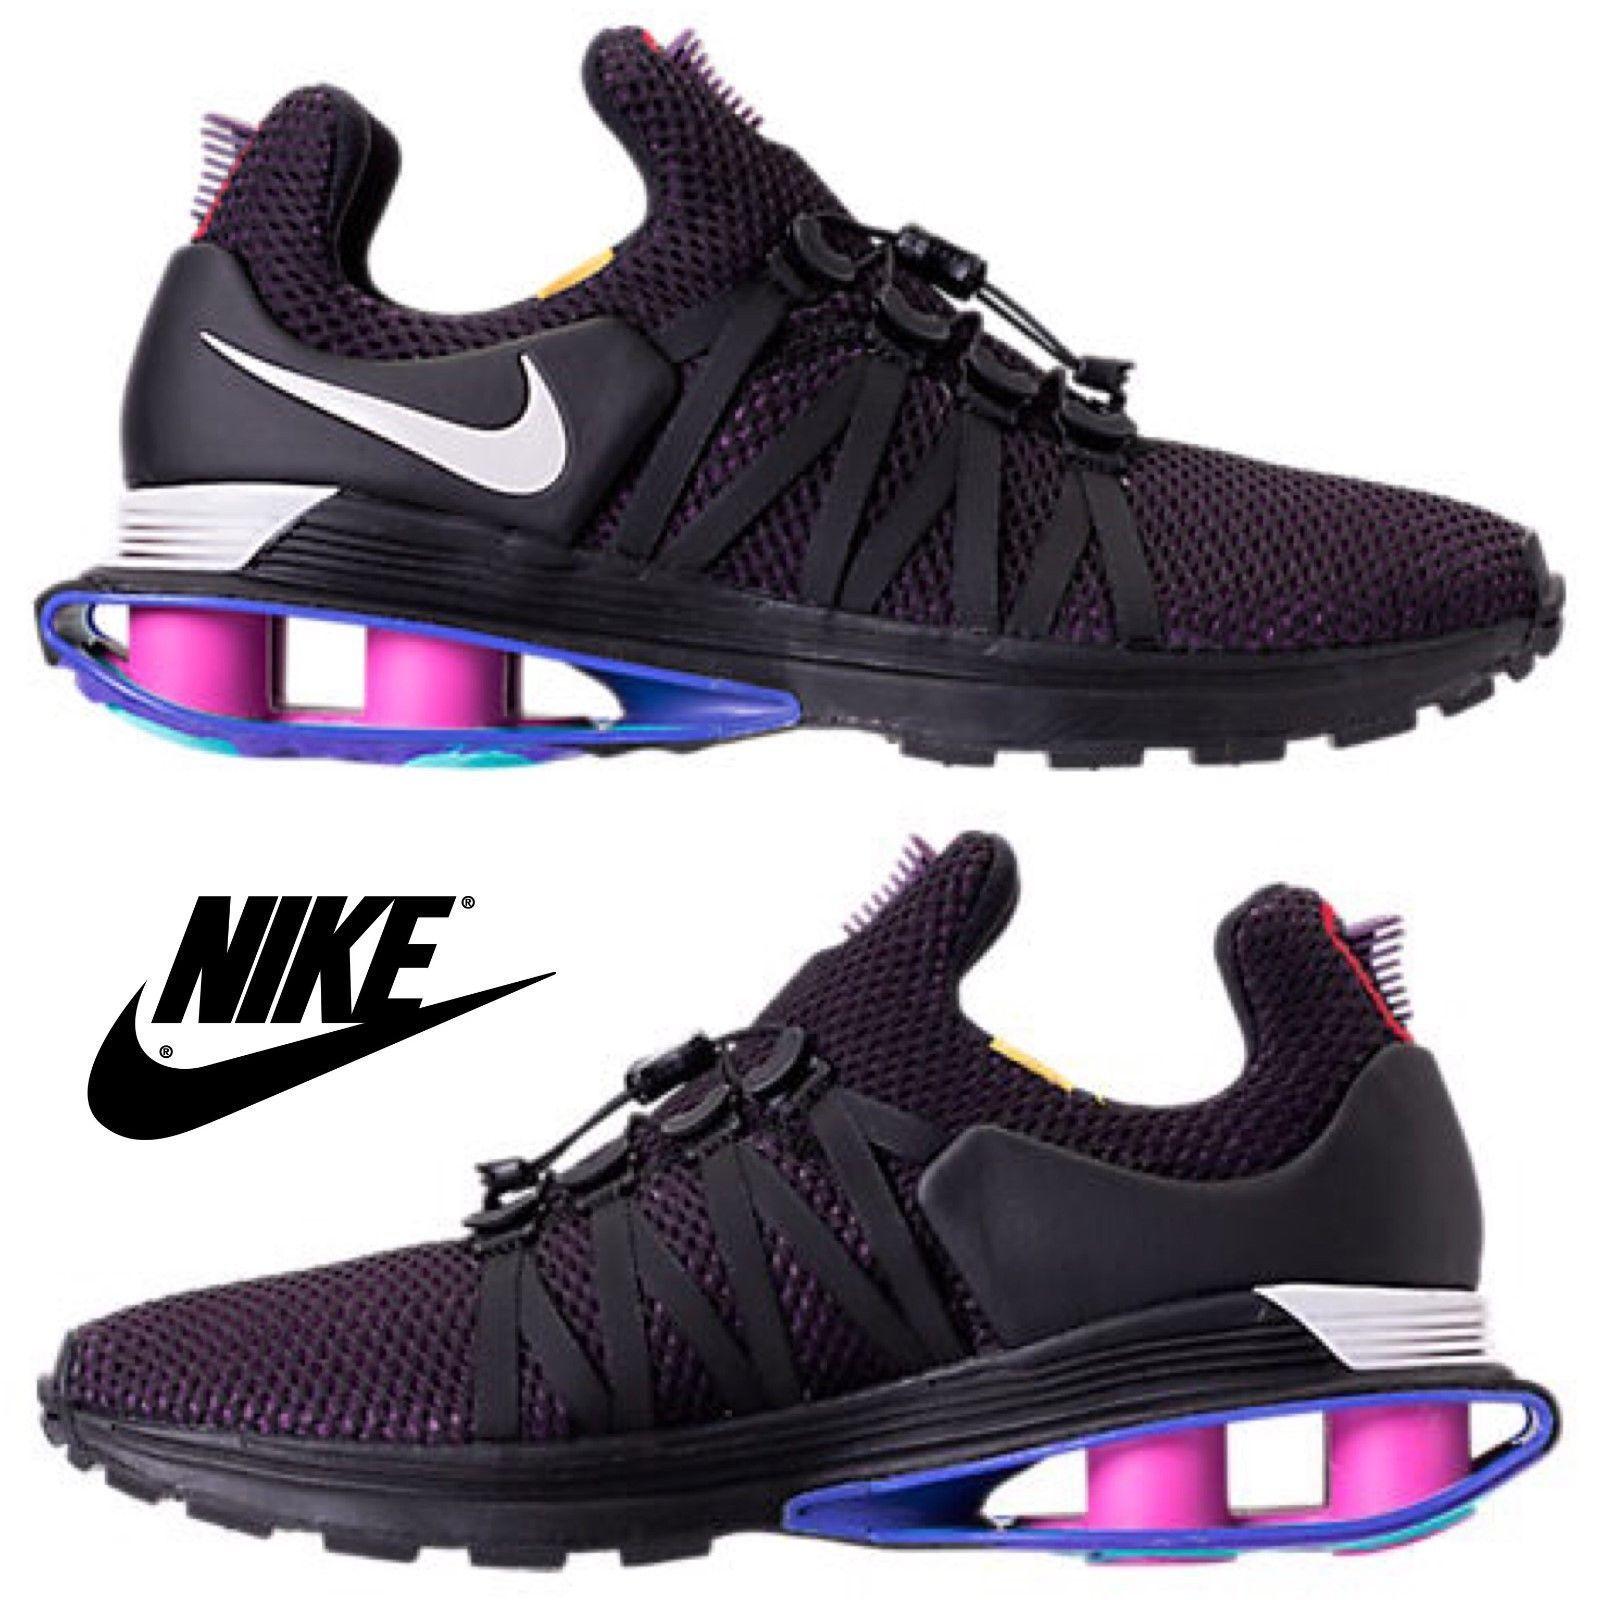 NIB Authentic NEW Homme Nike Shox Gravity AR1999-2018 Chaussures Torch Reax Bk Prpl